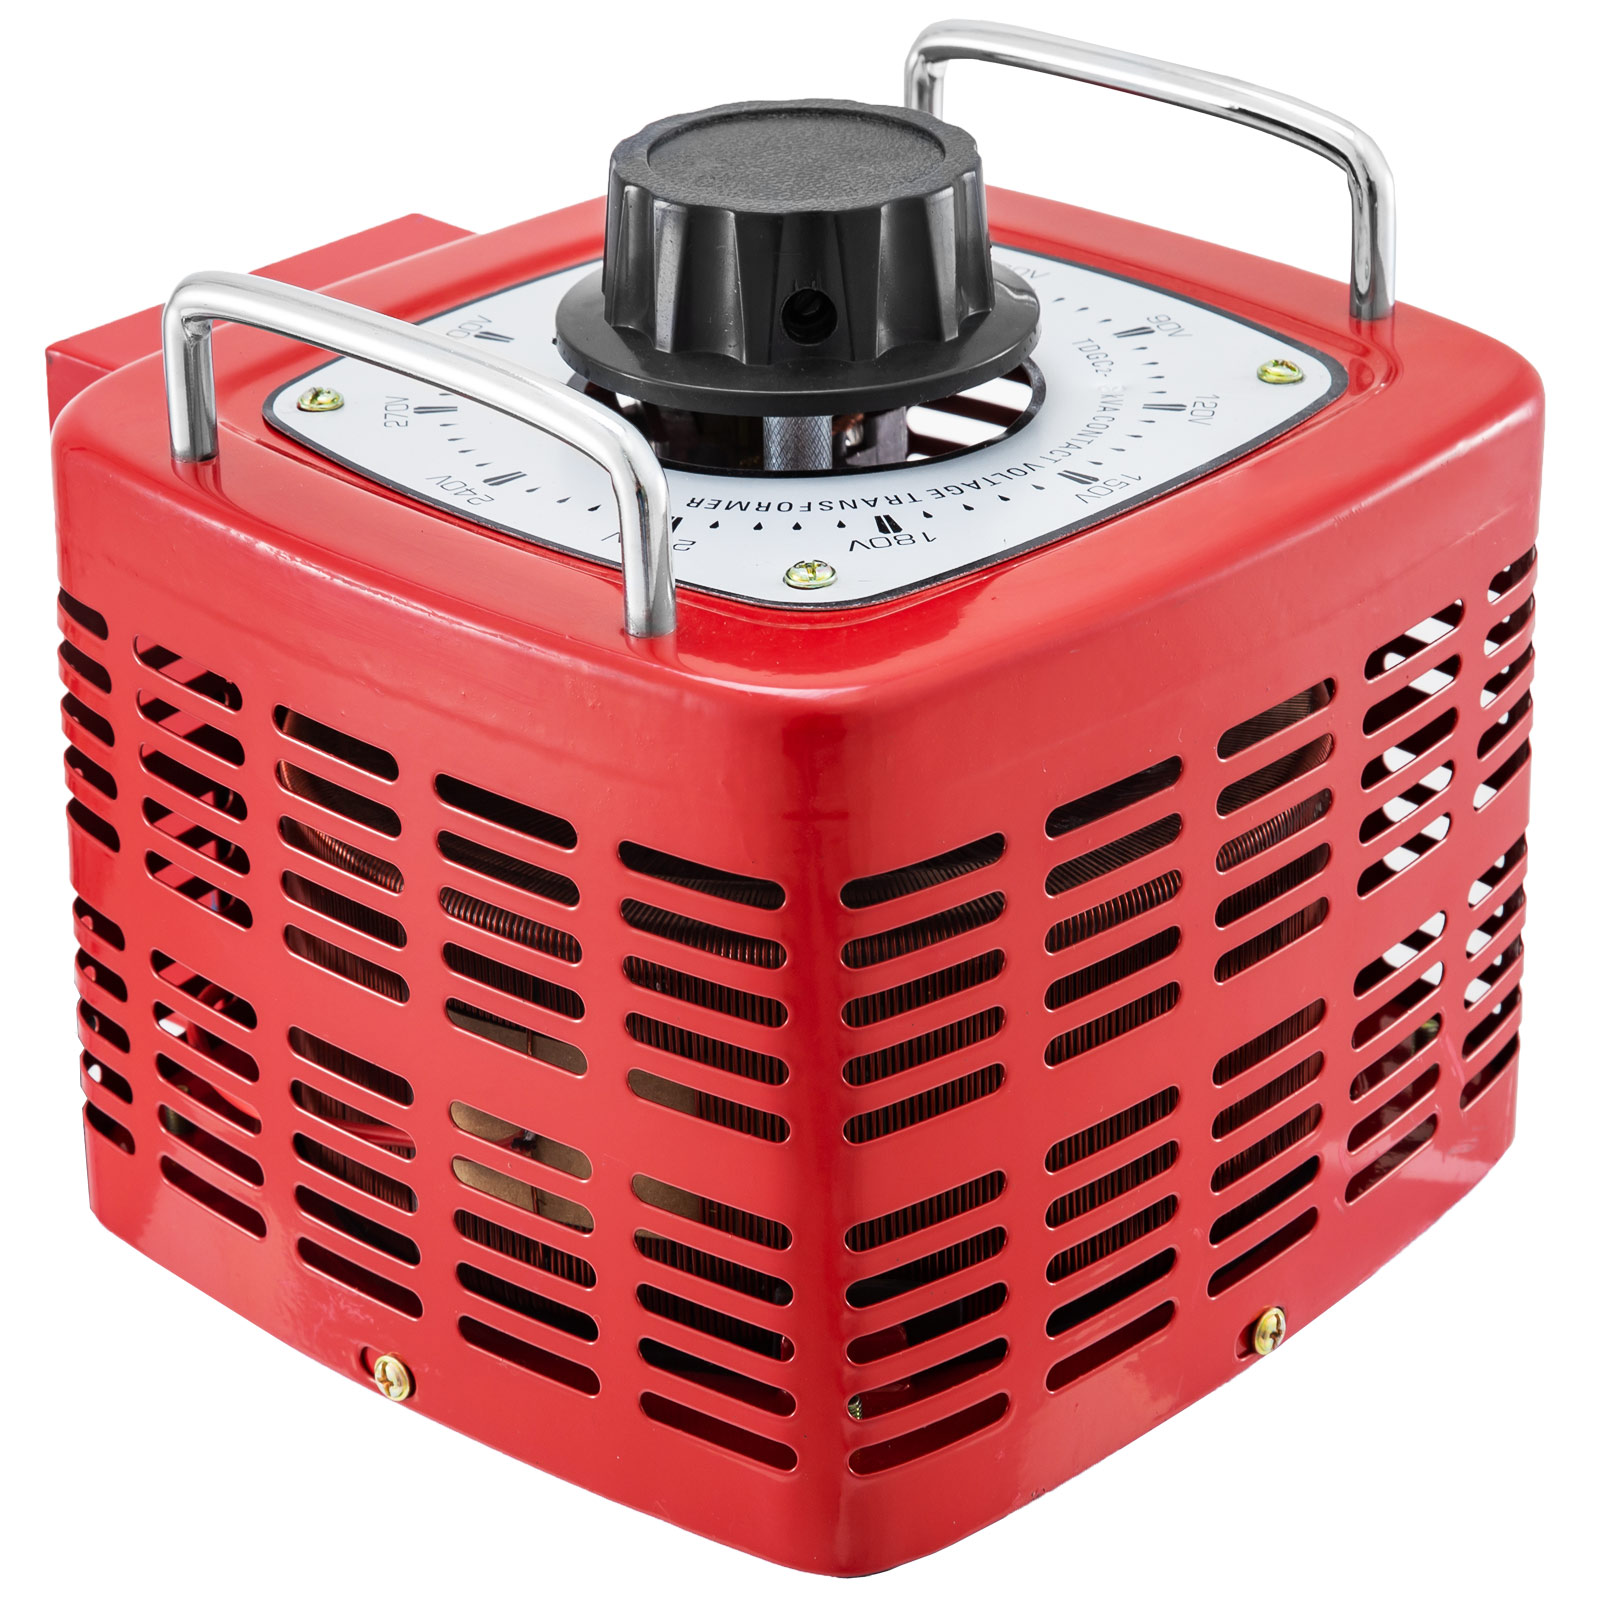 Auto-Variac-Variable-Transformer-0-5-1-2-3KVA-Regulator-pure-copper-coil-220V thumbnail 70